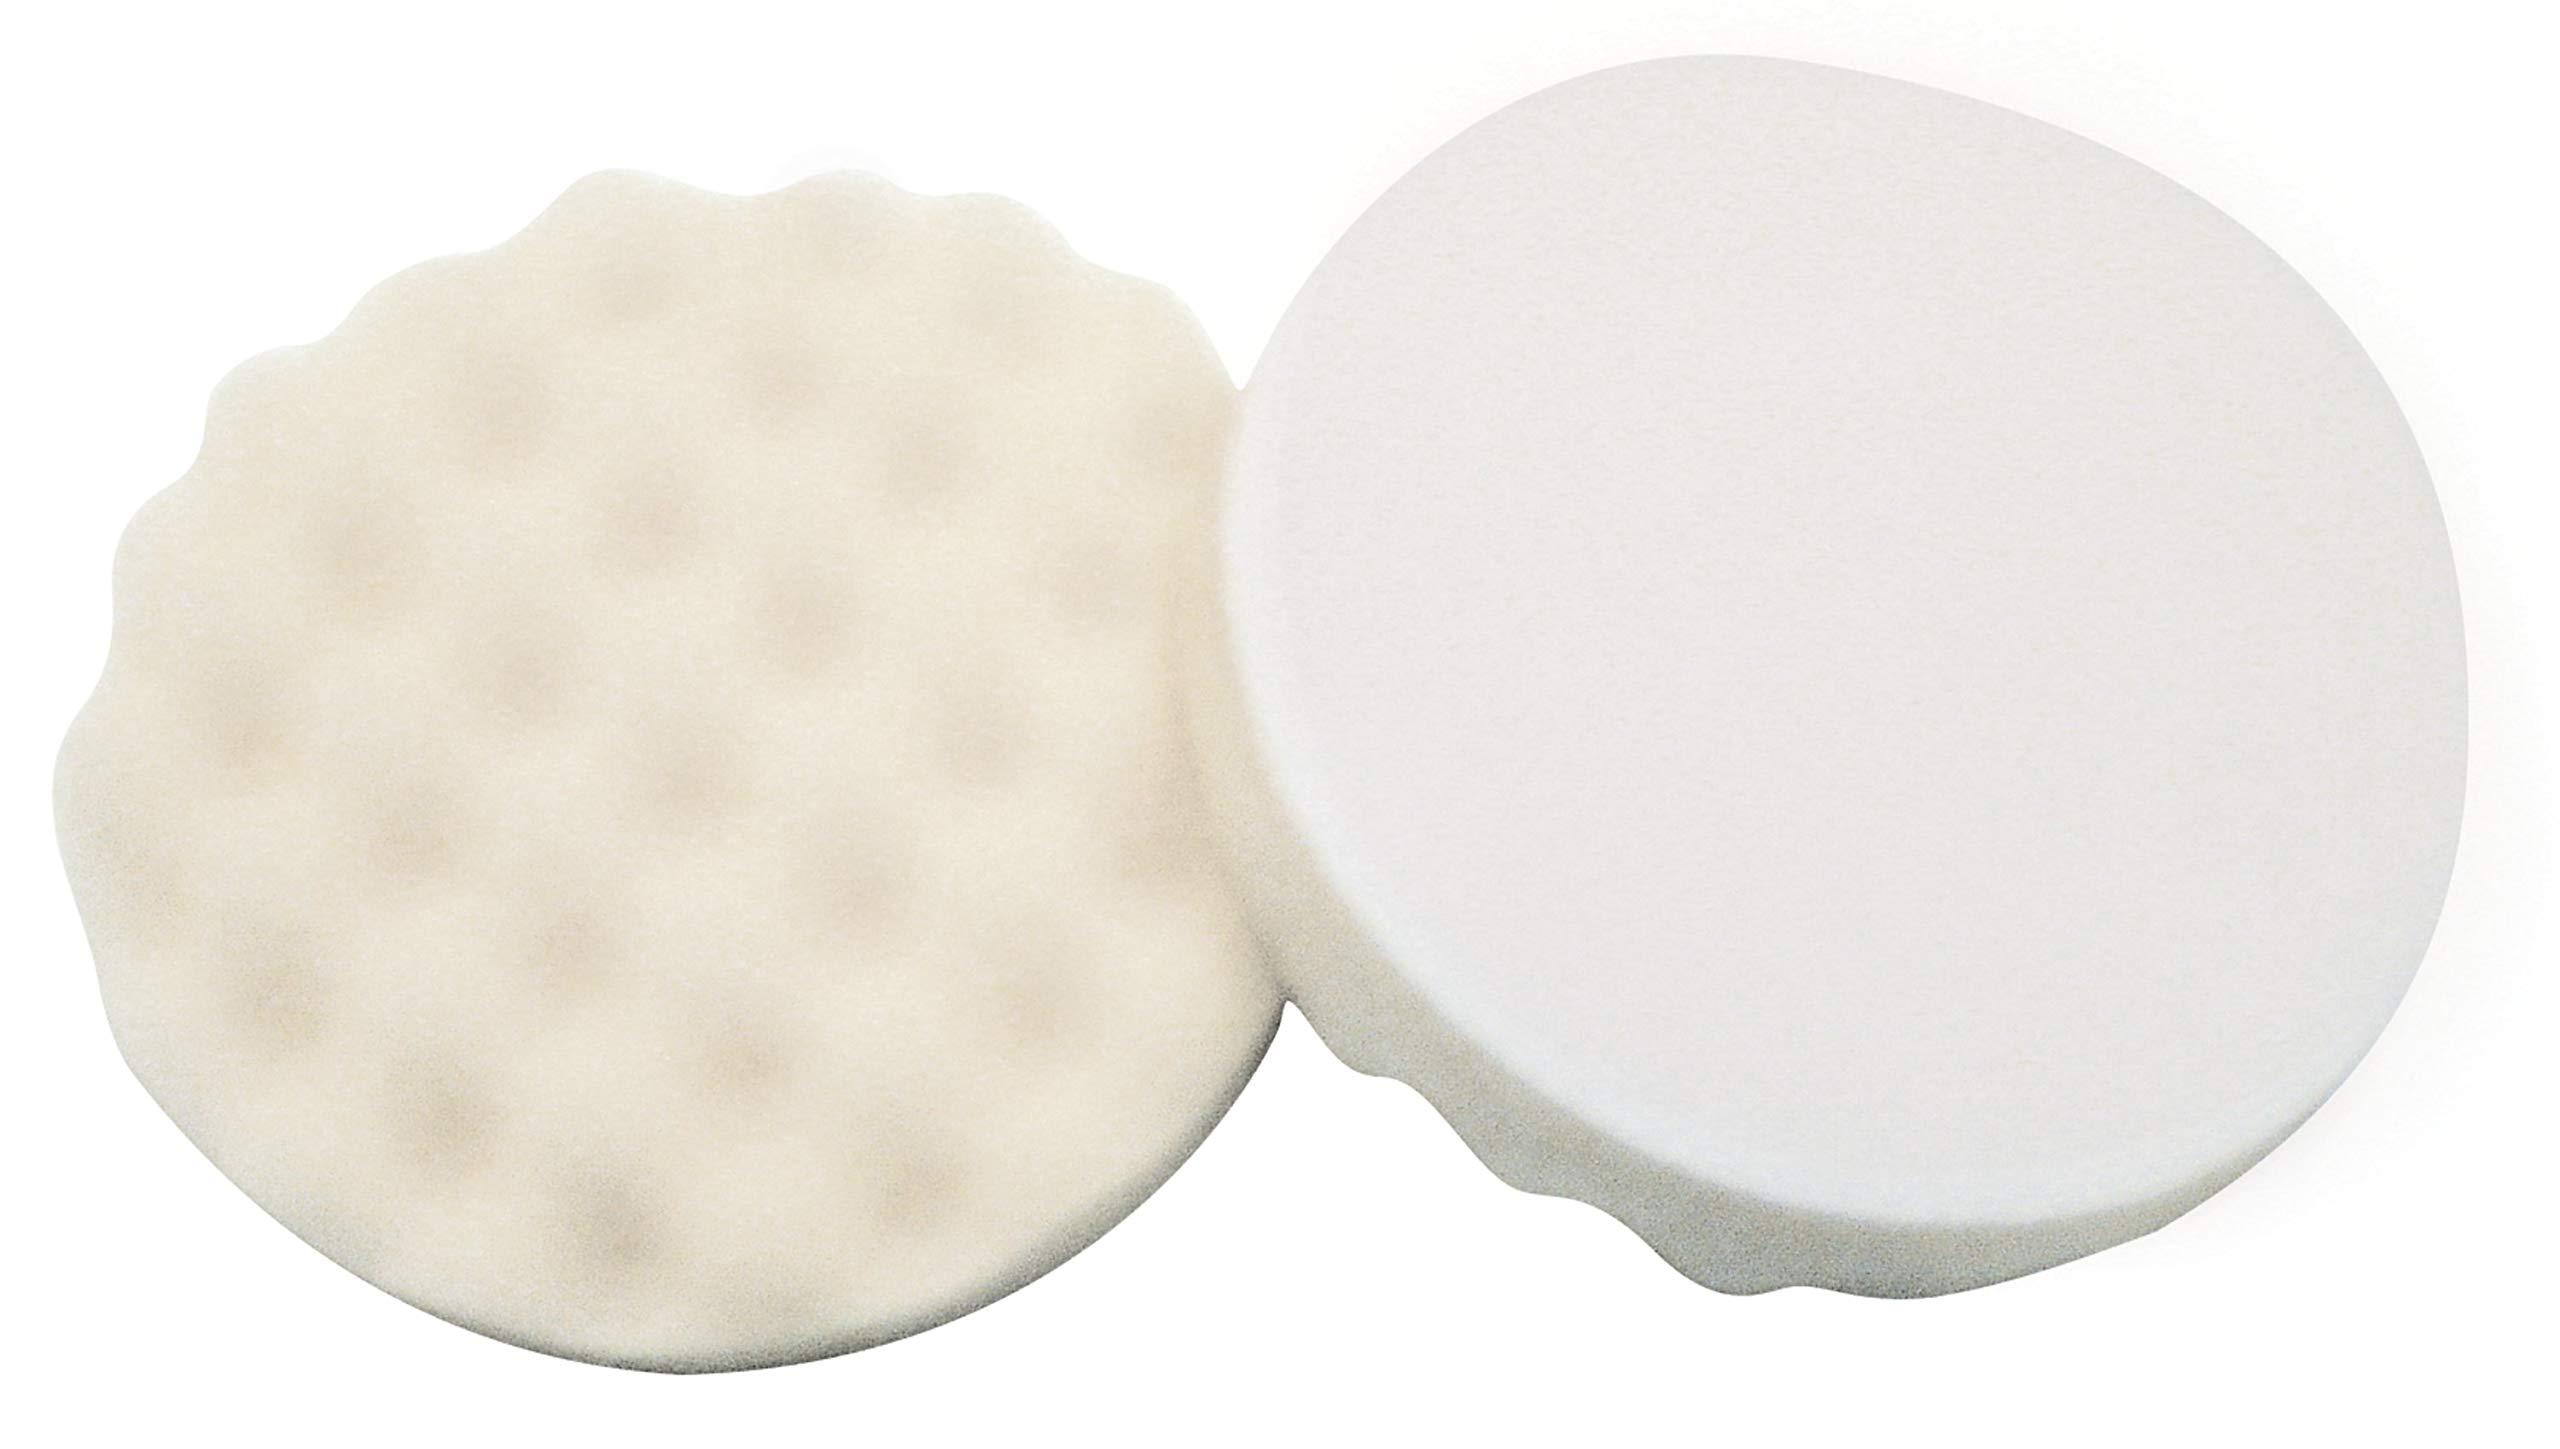 3M Finesse-it Buffing Pad 28401, 5-1/4 in White Open Cell Foam, 10 per Inner